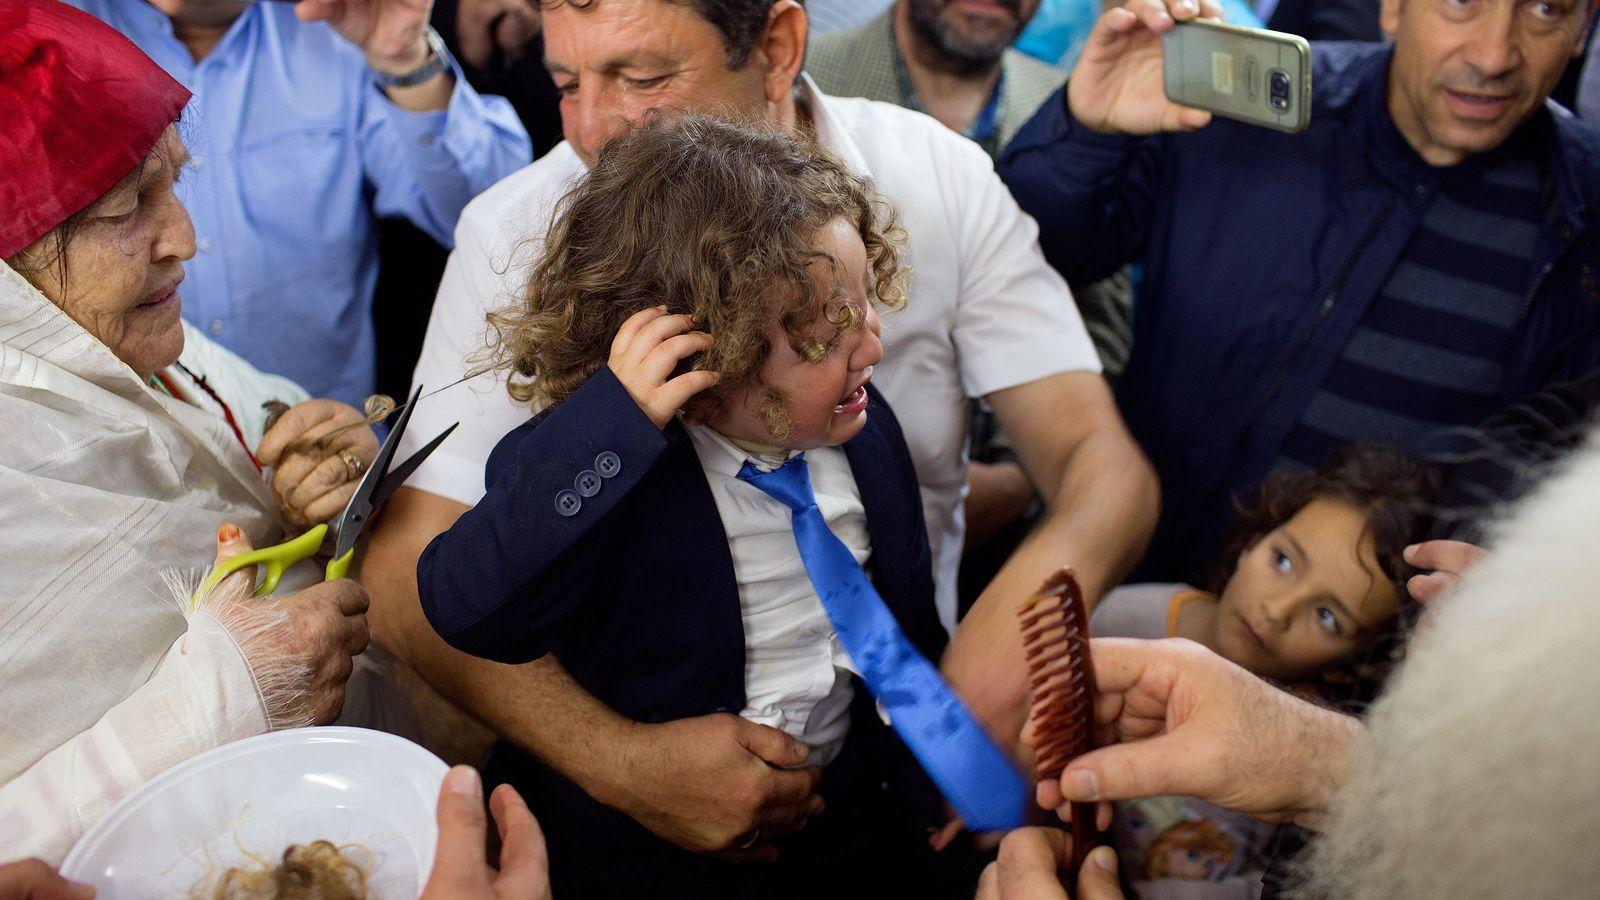 Weinender junge bekommt Haarschnitt